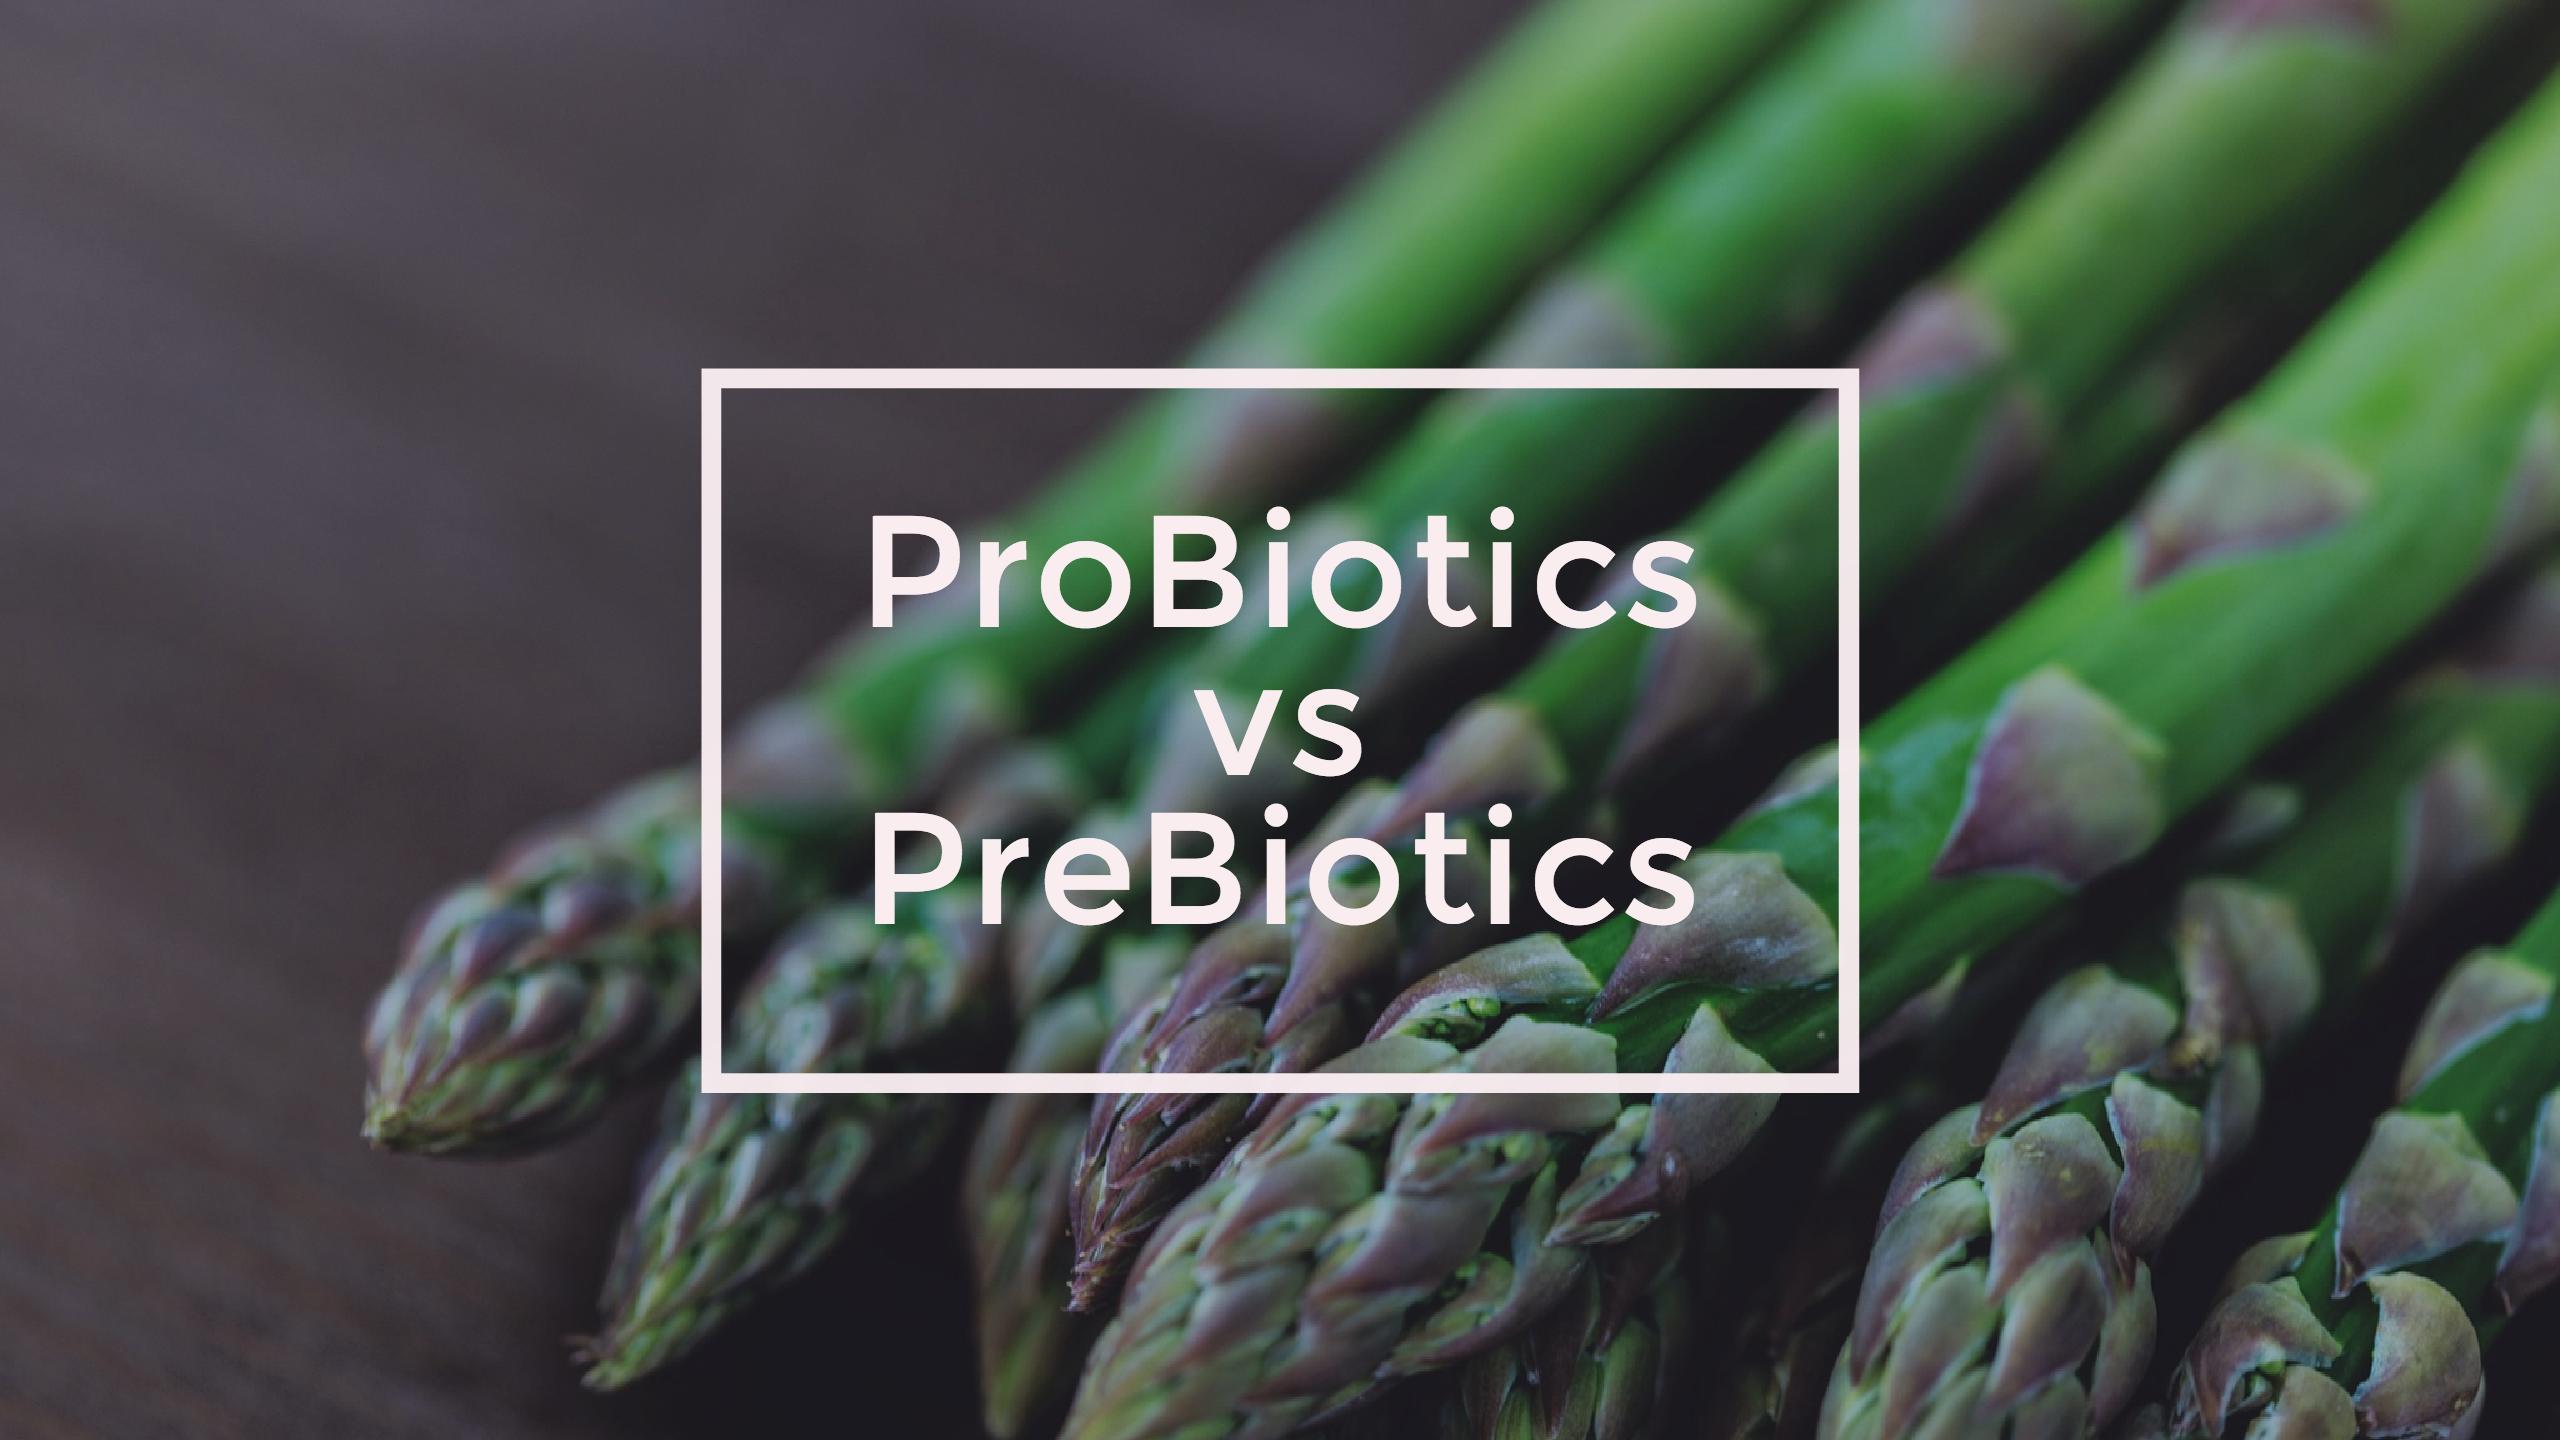 Probiotics vs prebiotics - Eat to treat